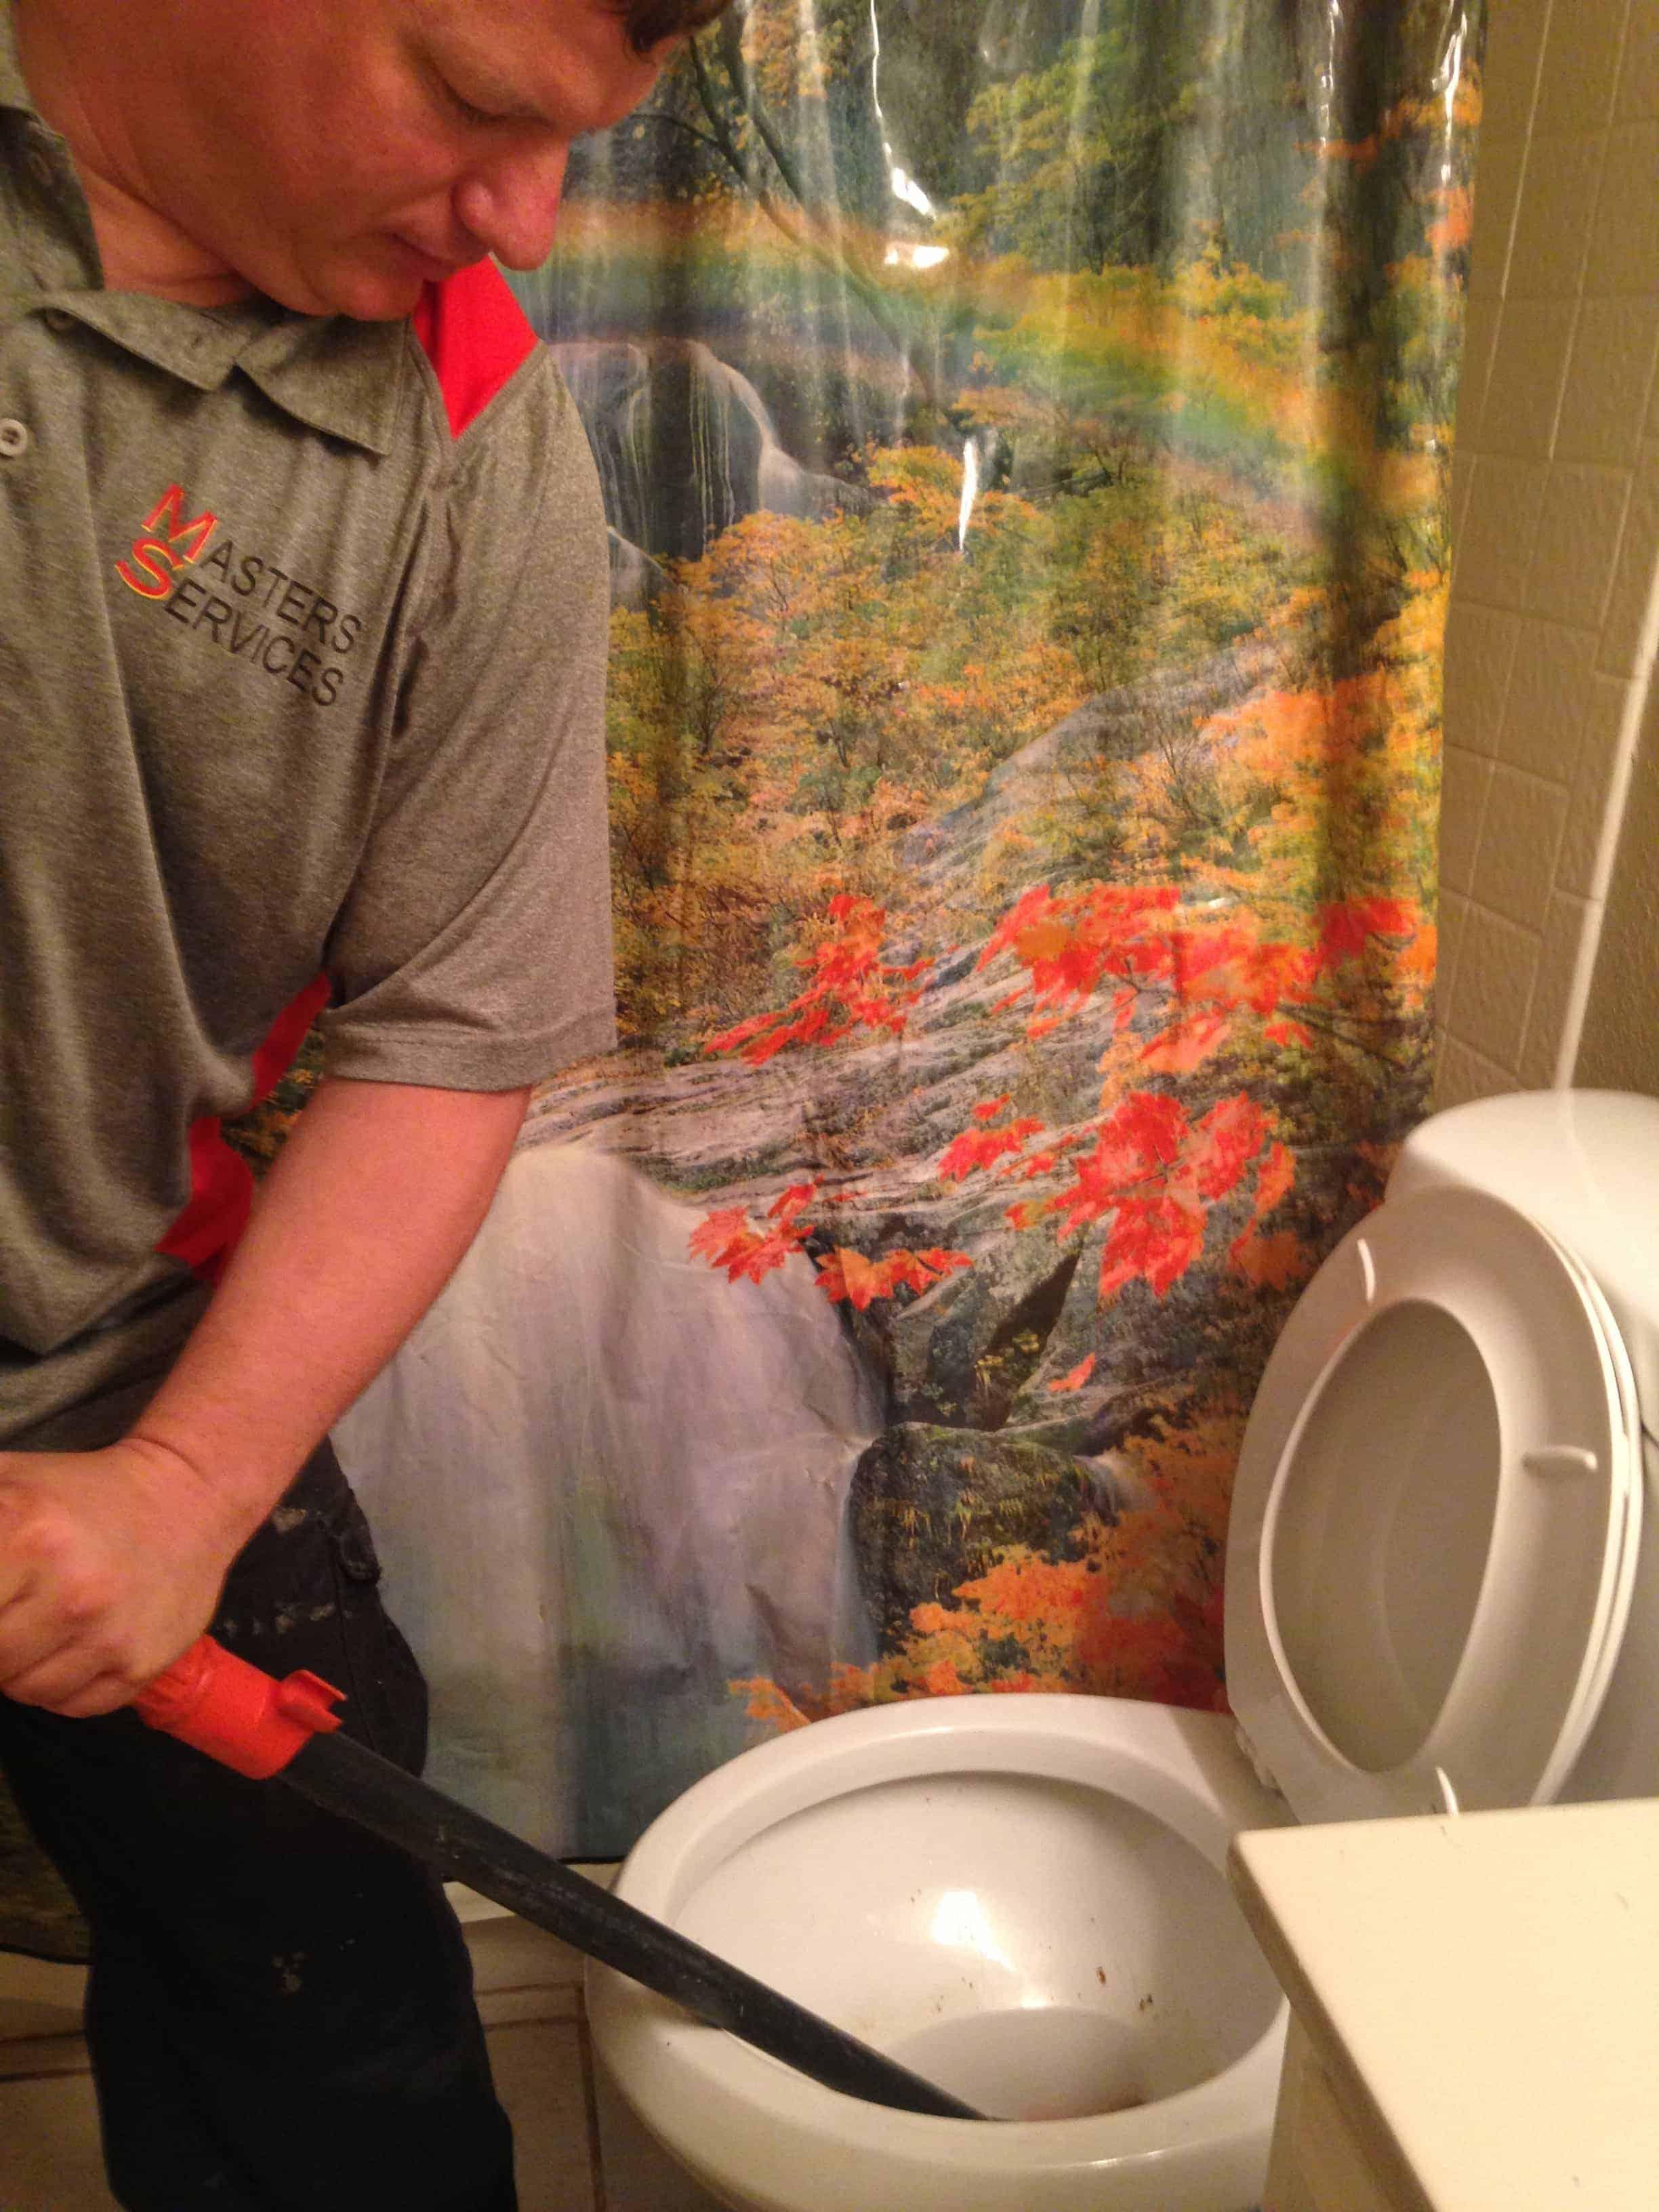 Employee During a Plumbing Job